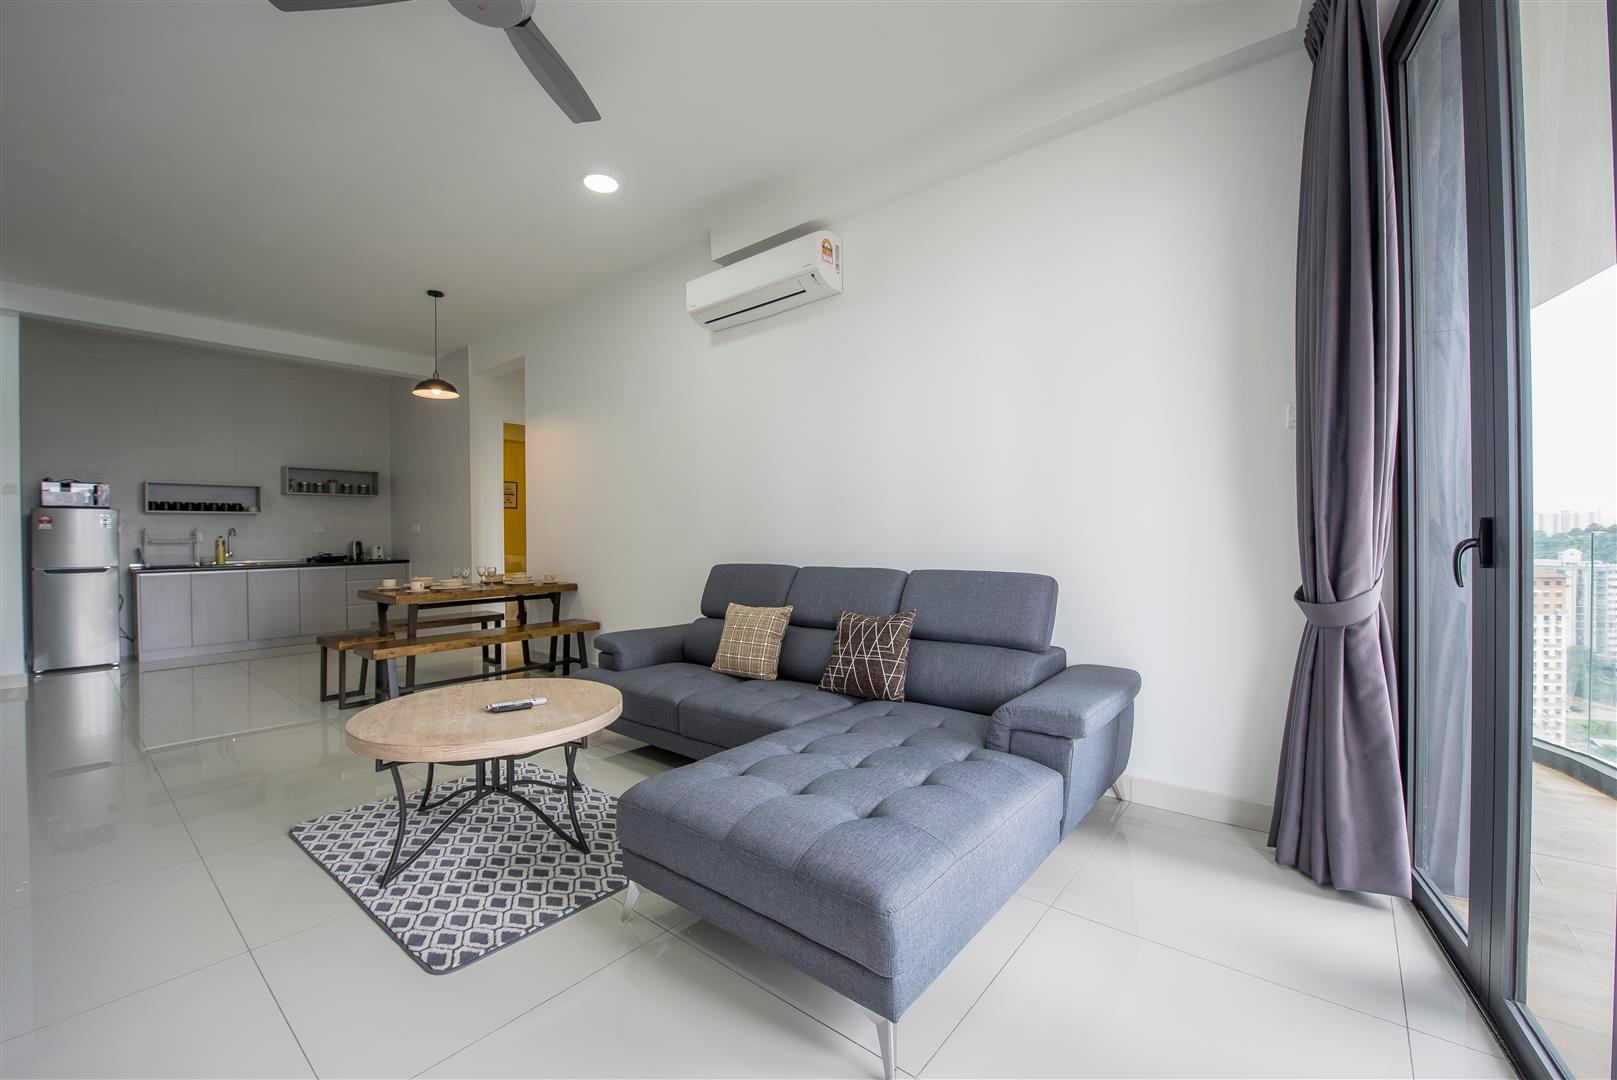 3 Bedrooms Arte S Condo @ Free High Speed Wifi